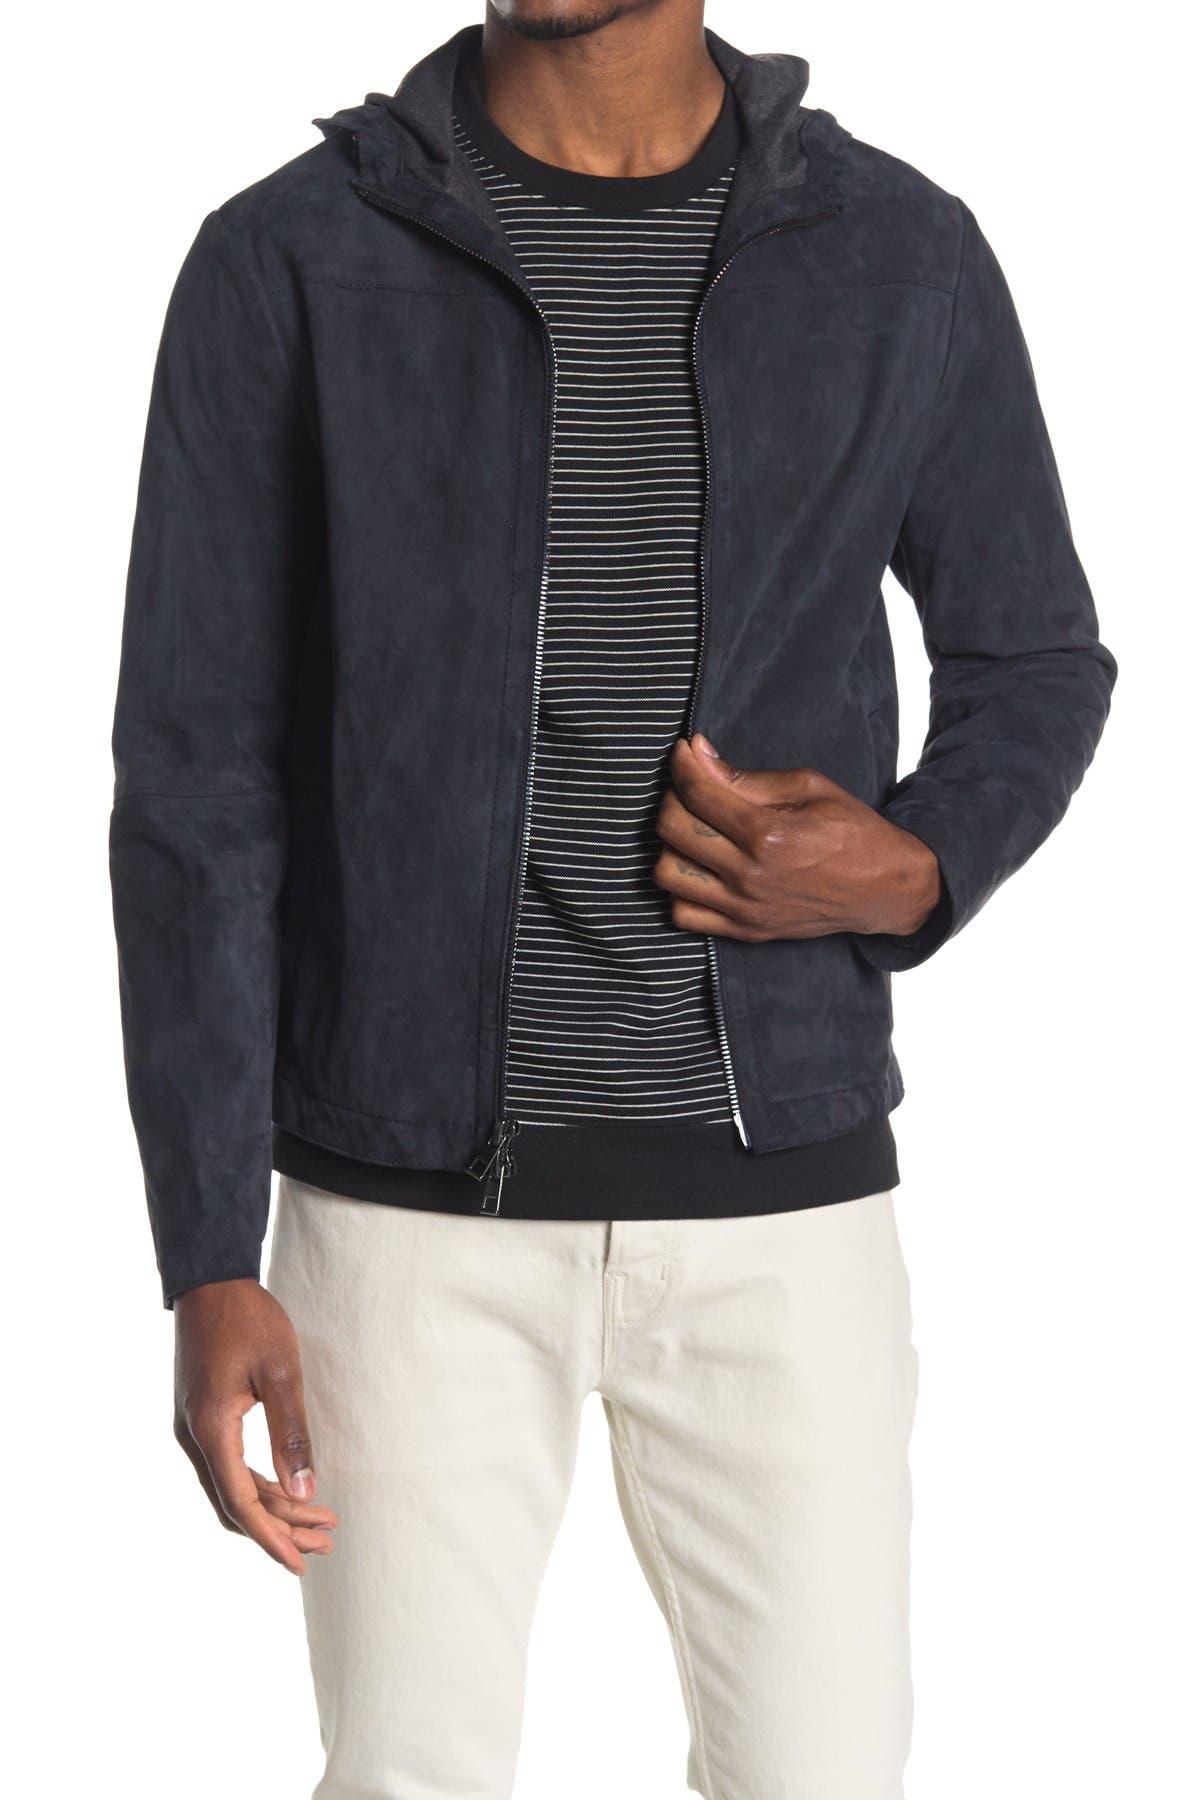 Image of Michael Kors Bonded Suede Jacket